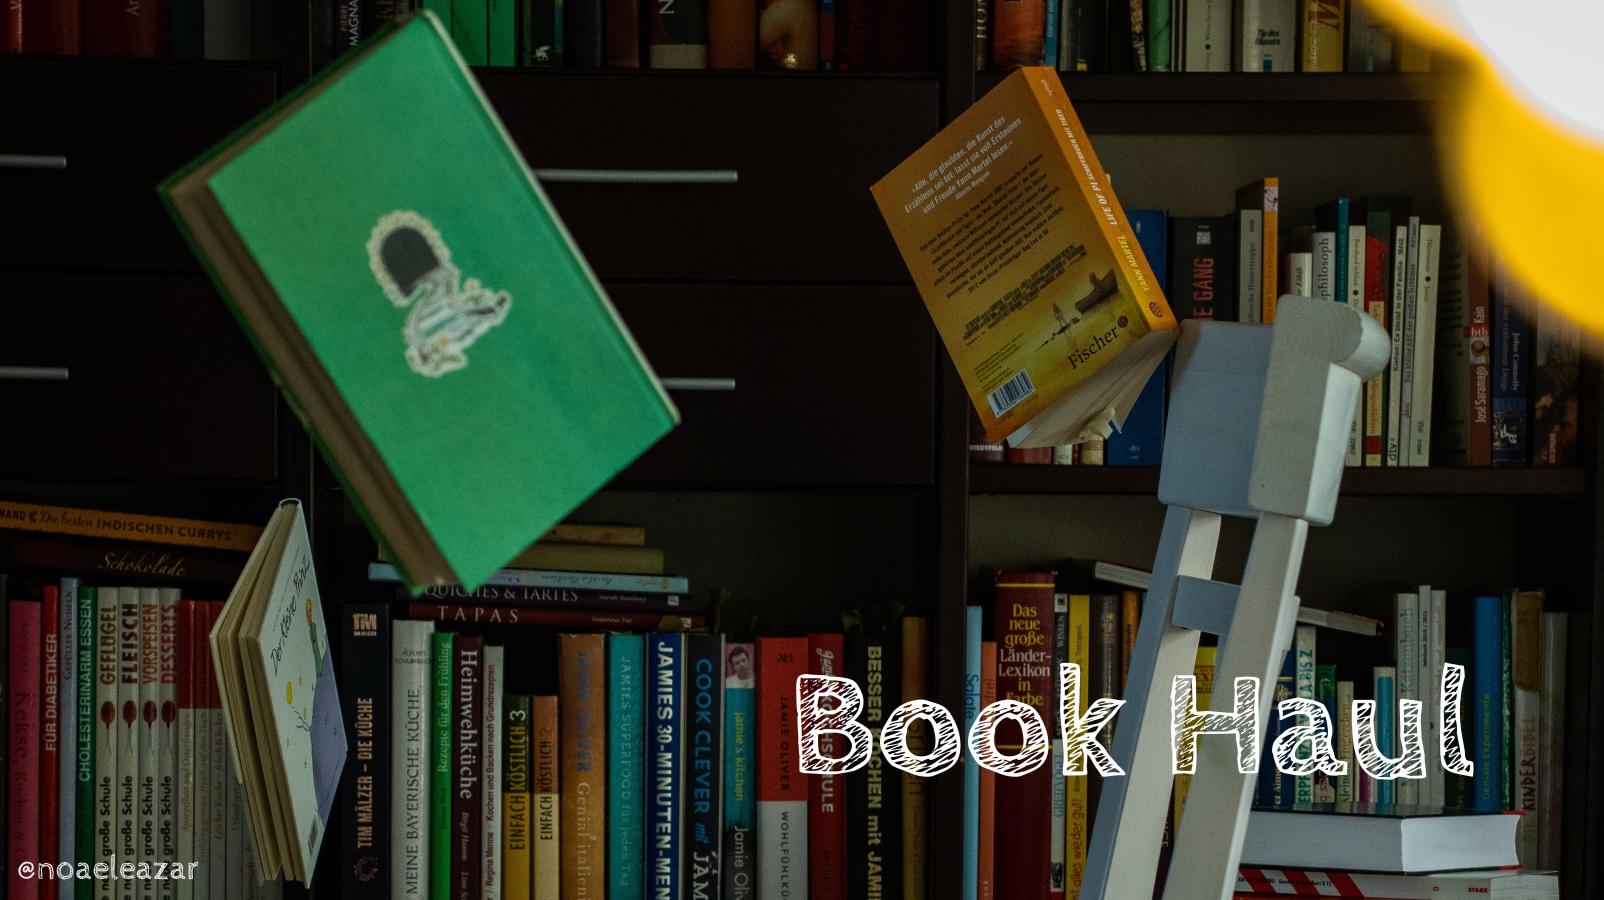 Book Haul - foto por Noa Eleazar